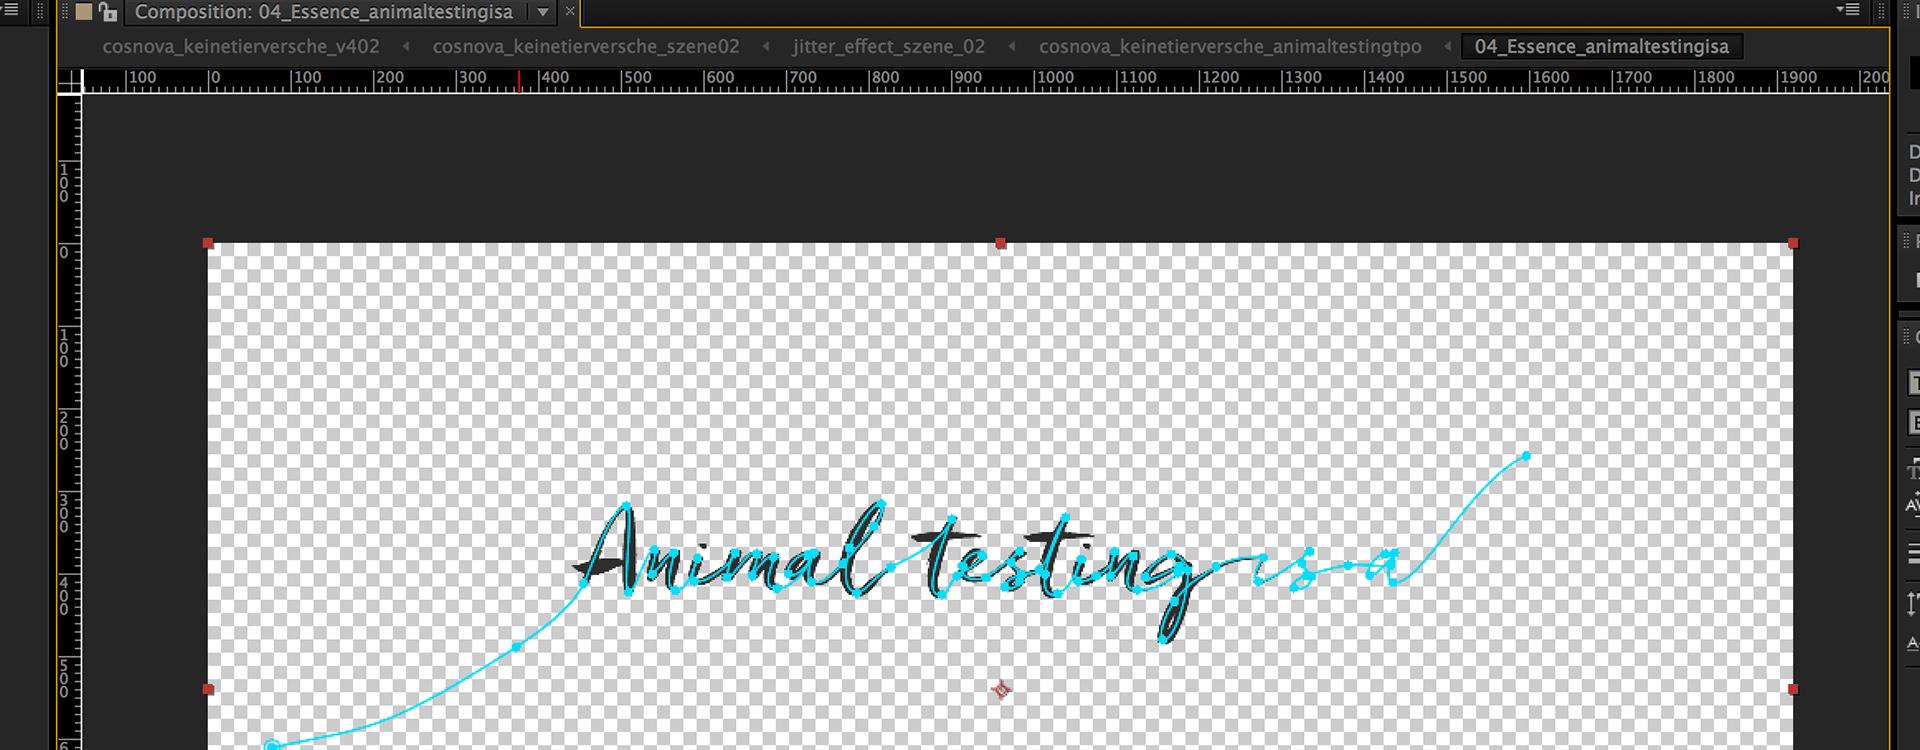 noanimaltesting_animal_typo